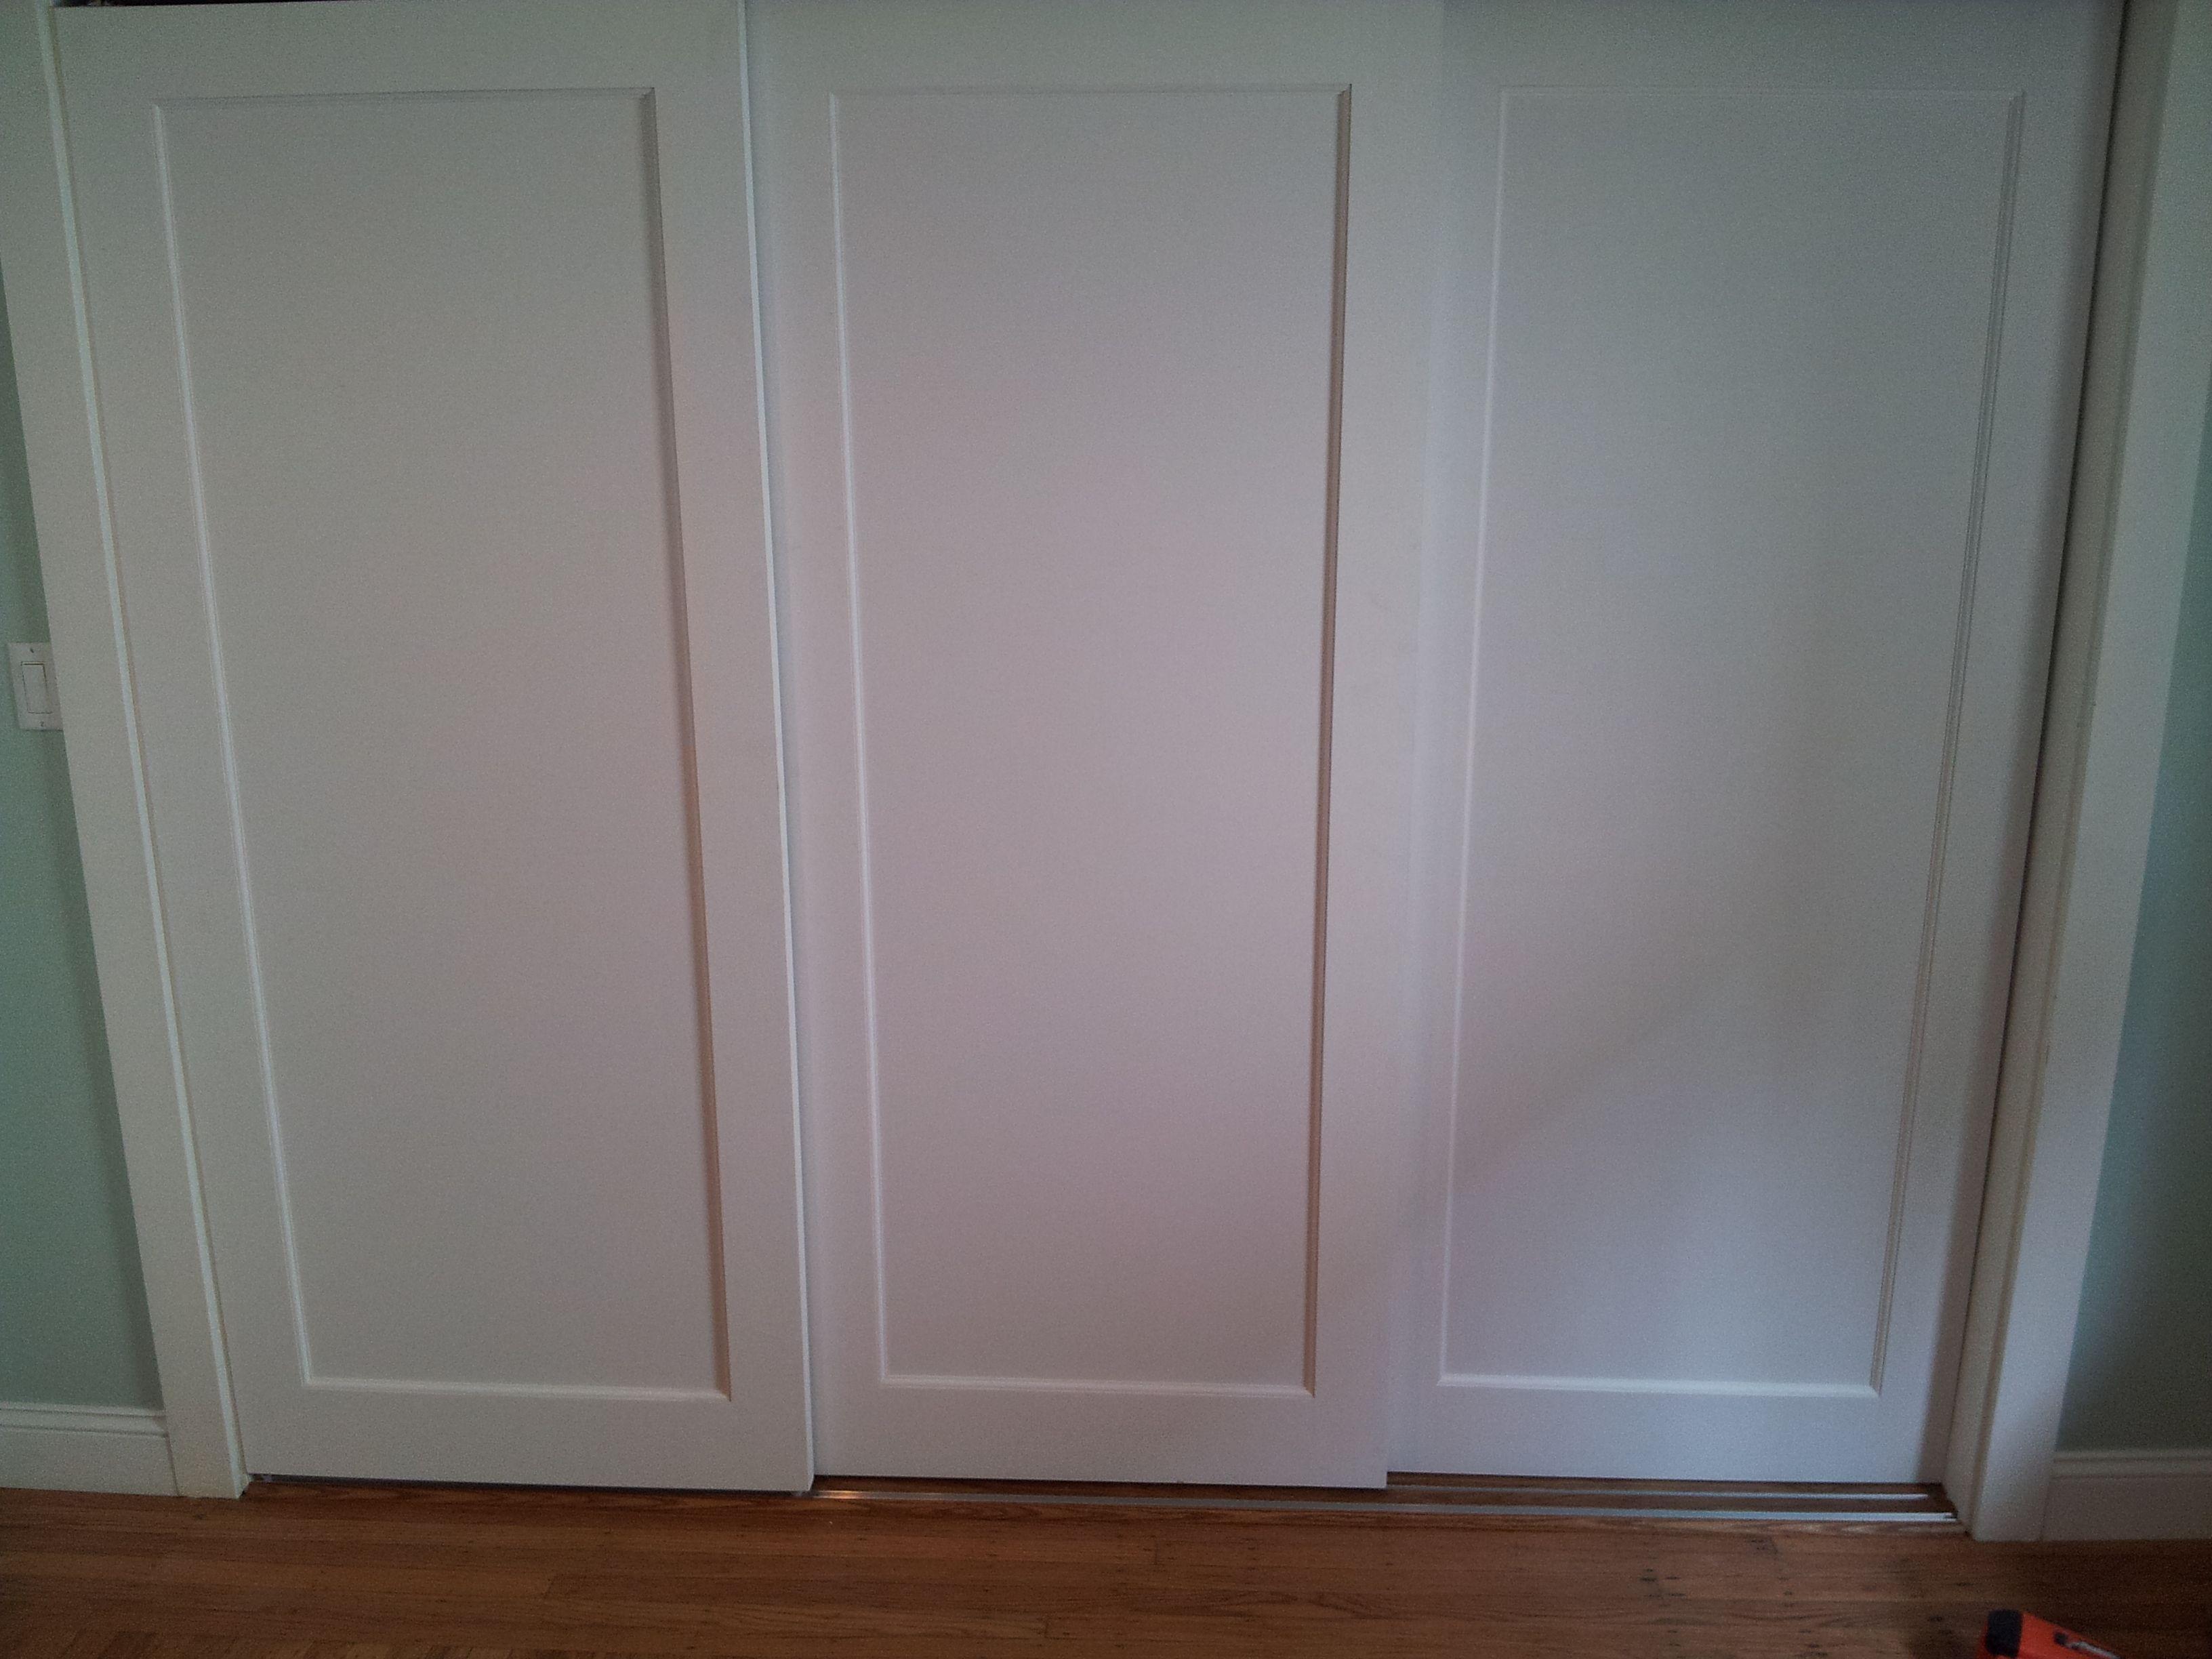 Panel Doors Closet & ClosetDoors5